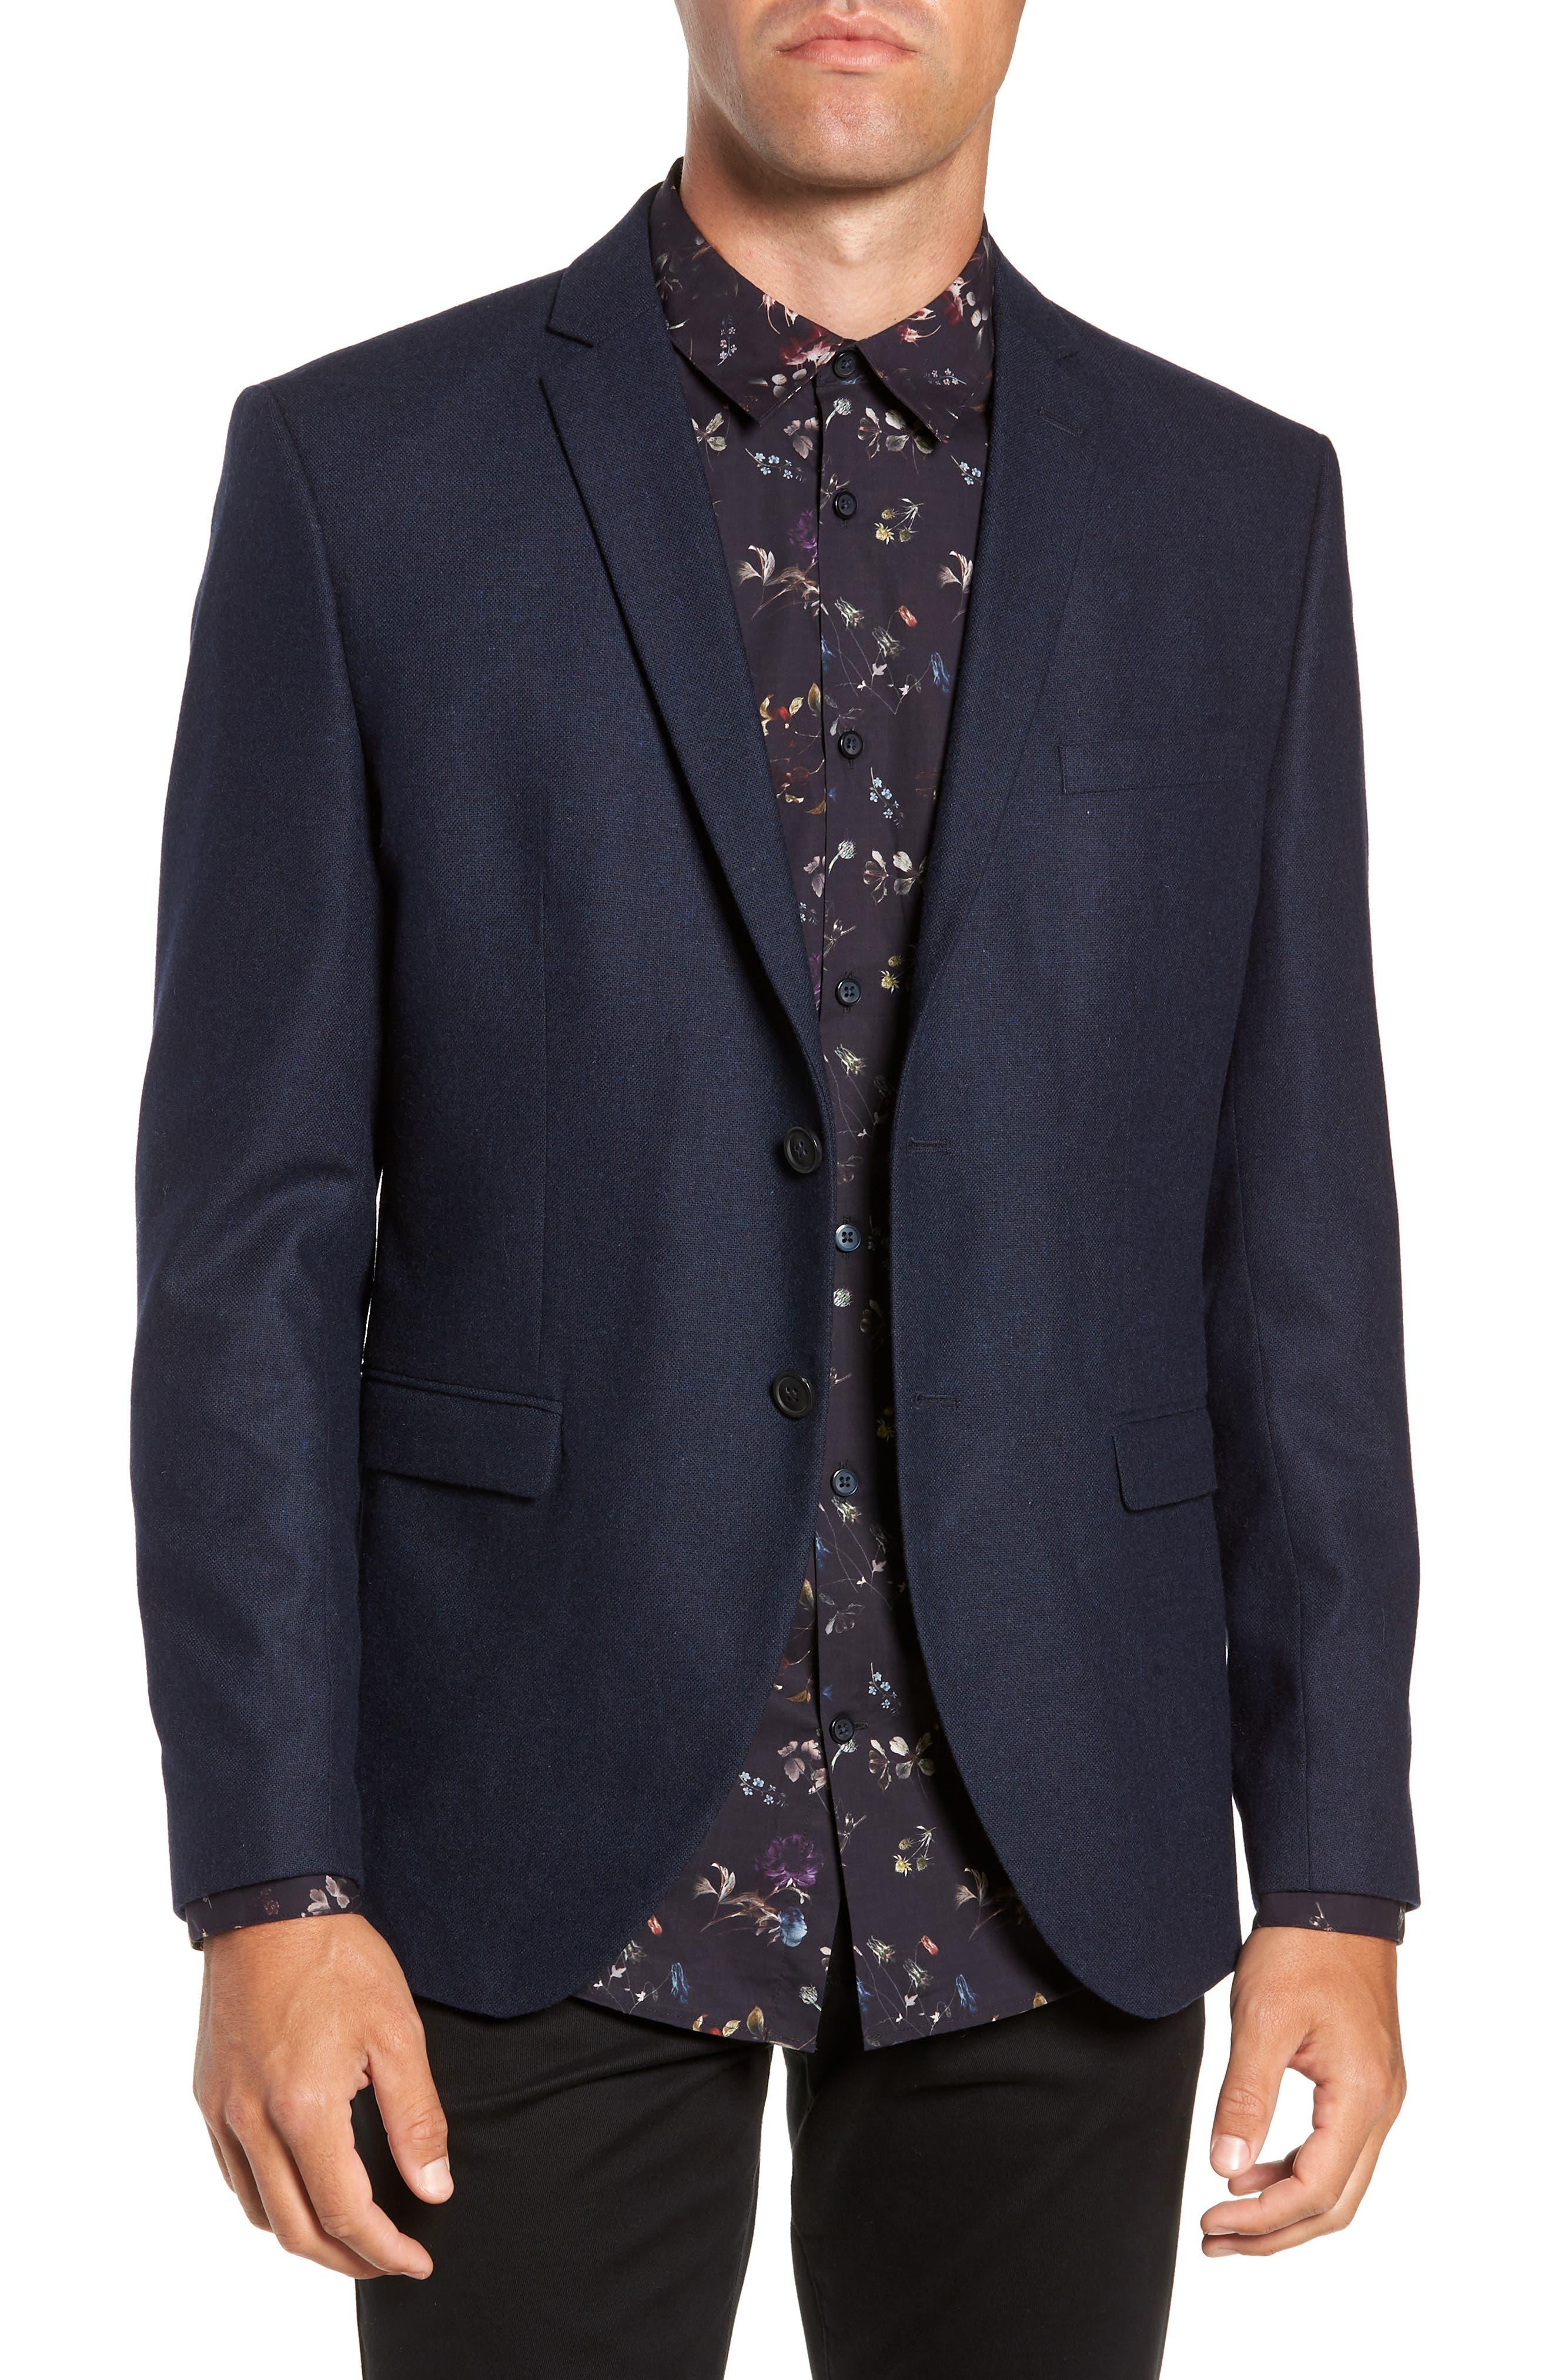 Myloiver Slim Fit Wool Blend Blazer,                         Main,                         color, DARK NAVY